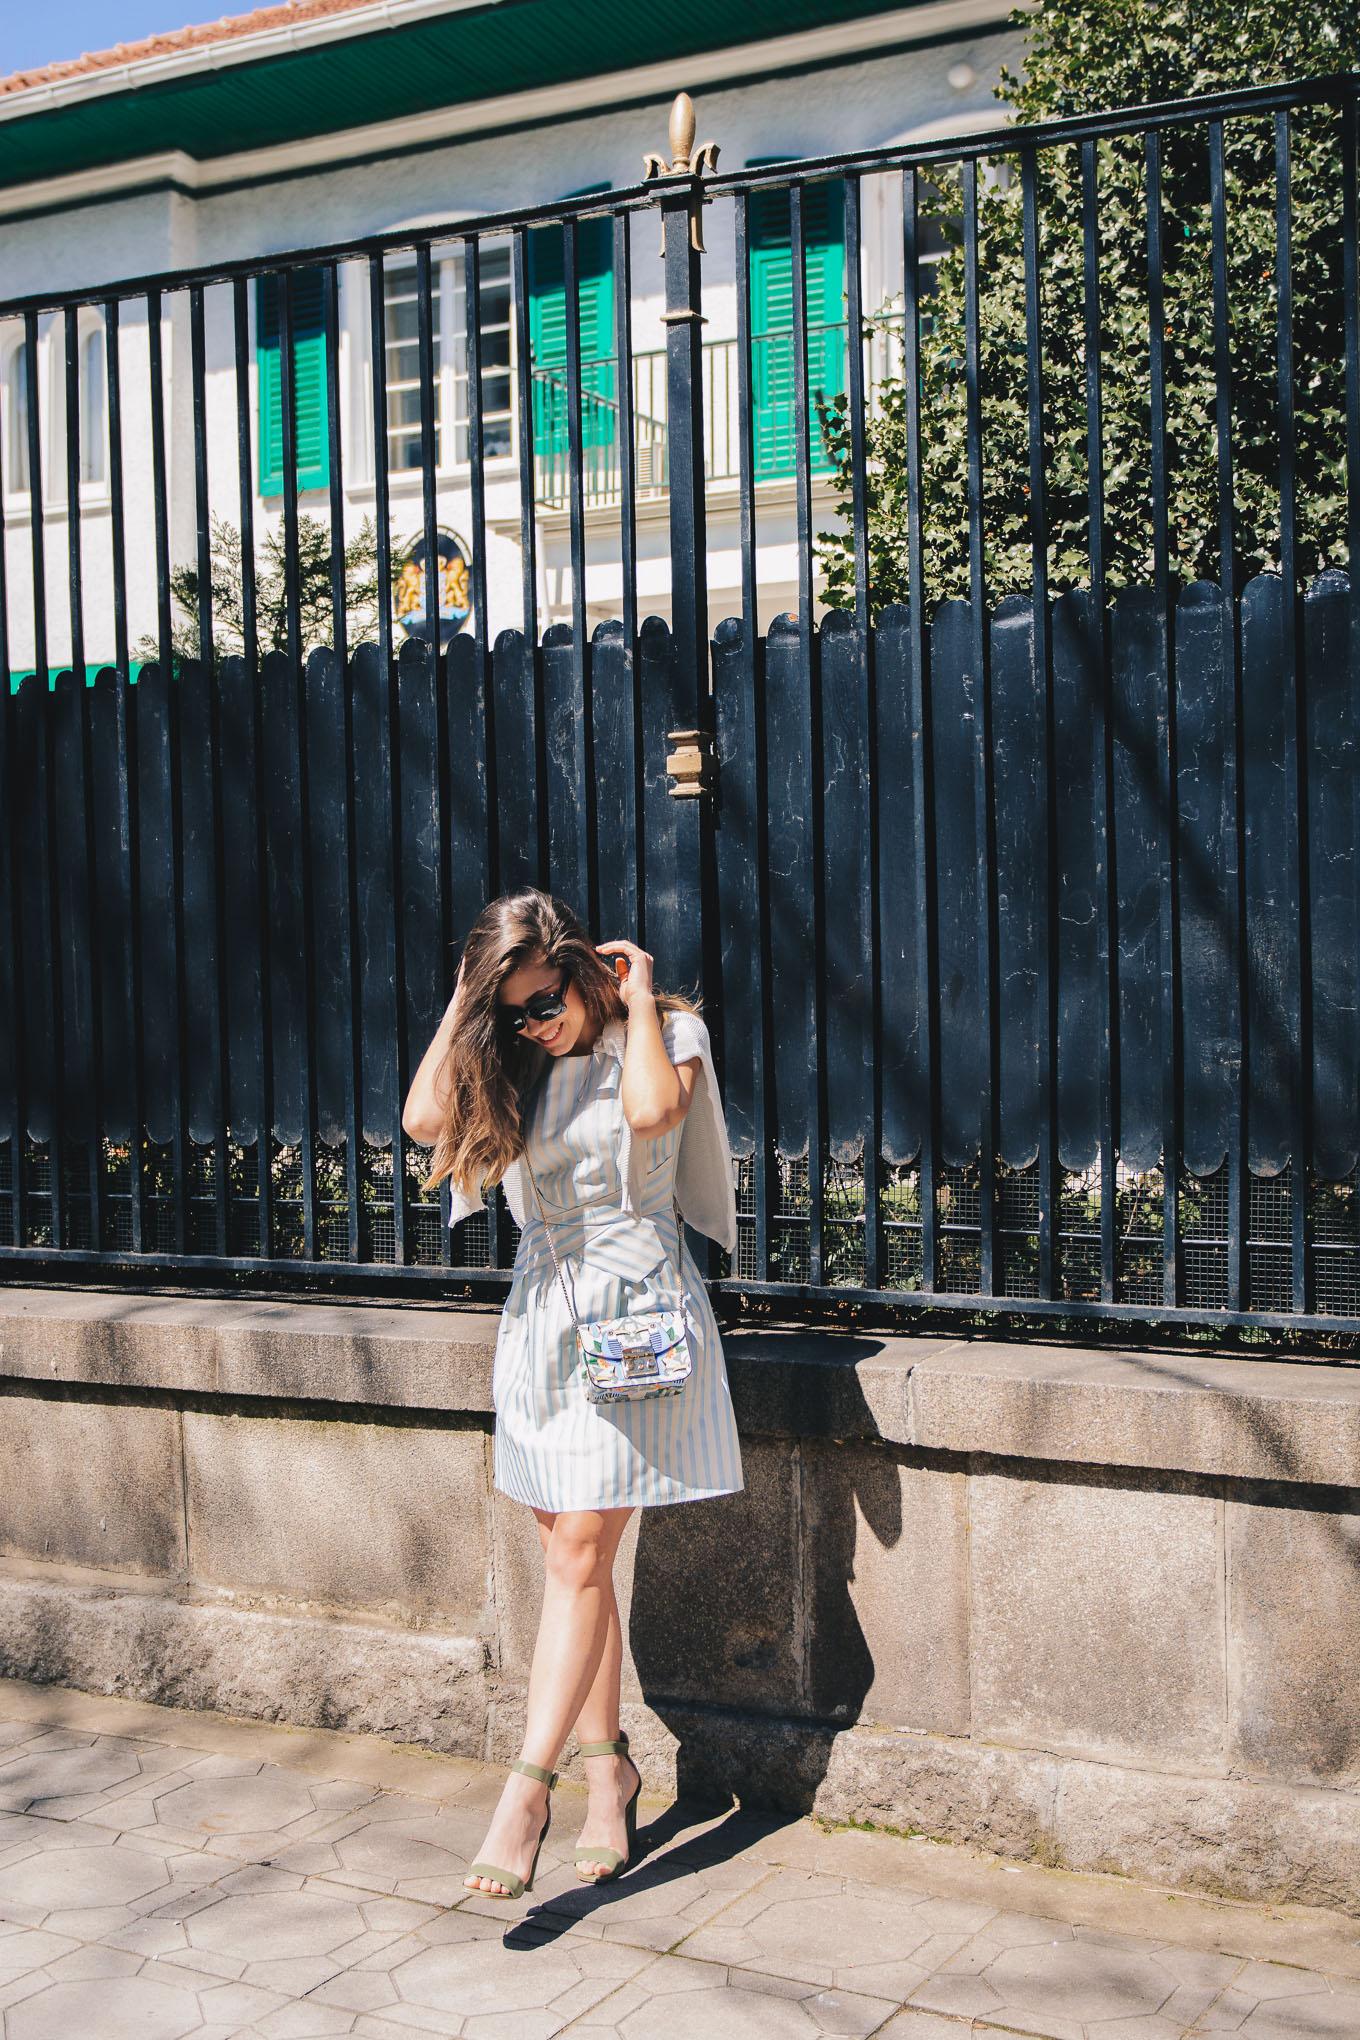 Bulgaria blogger wearing striped dress